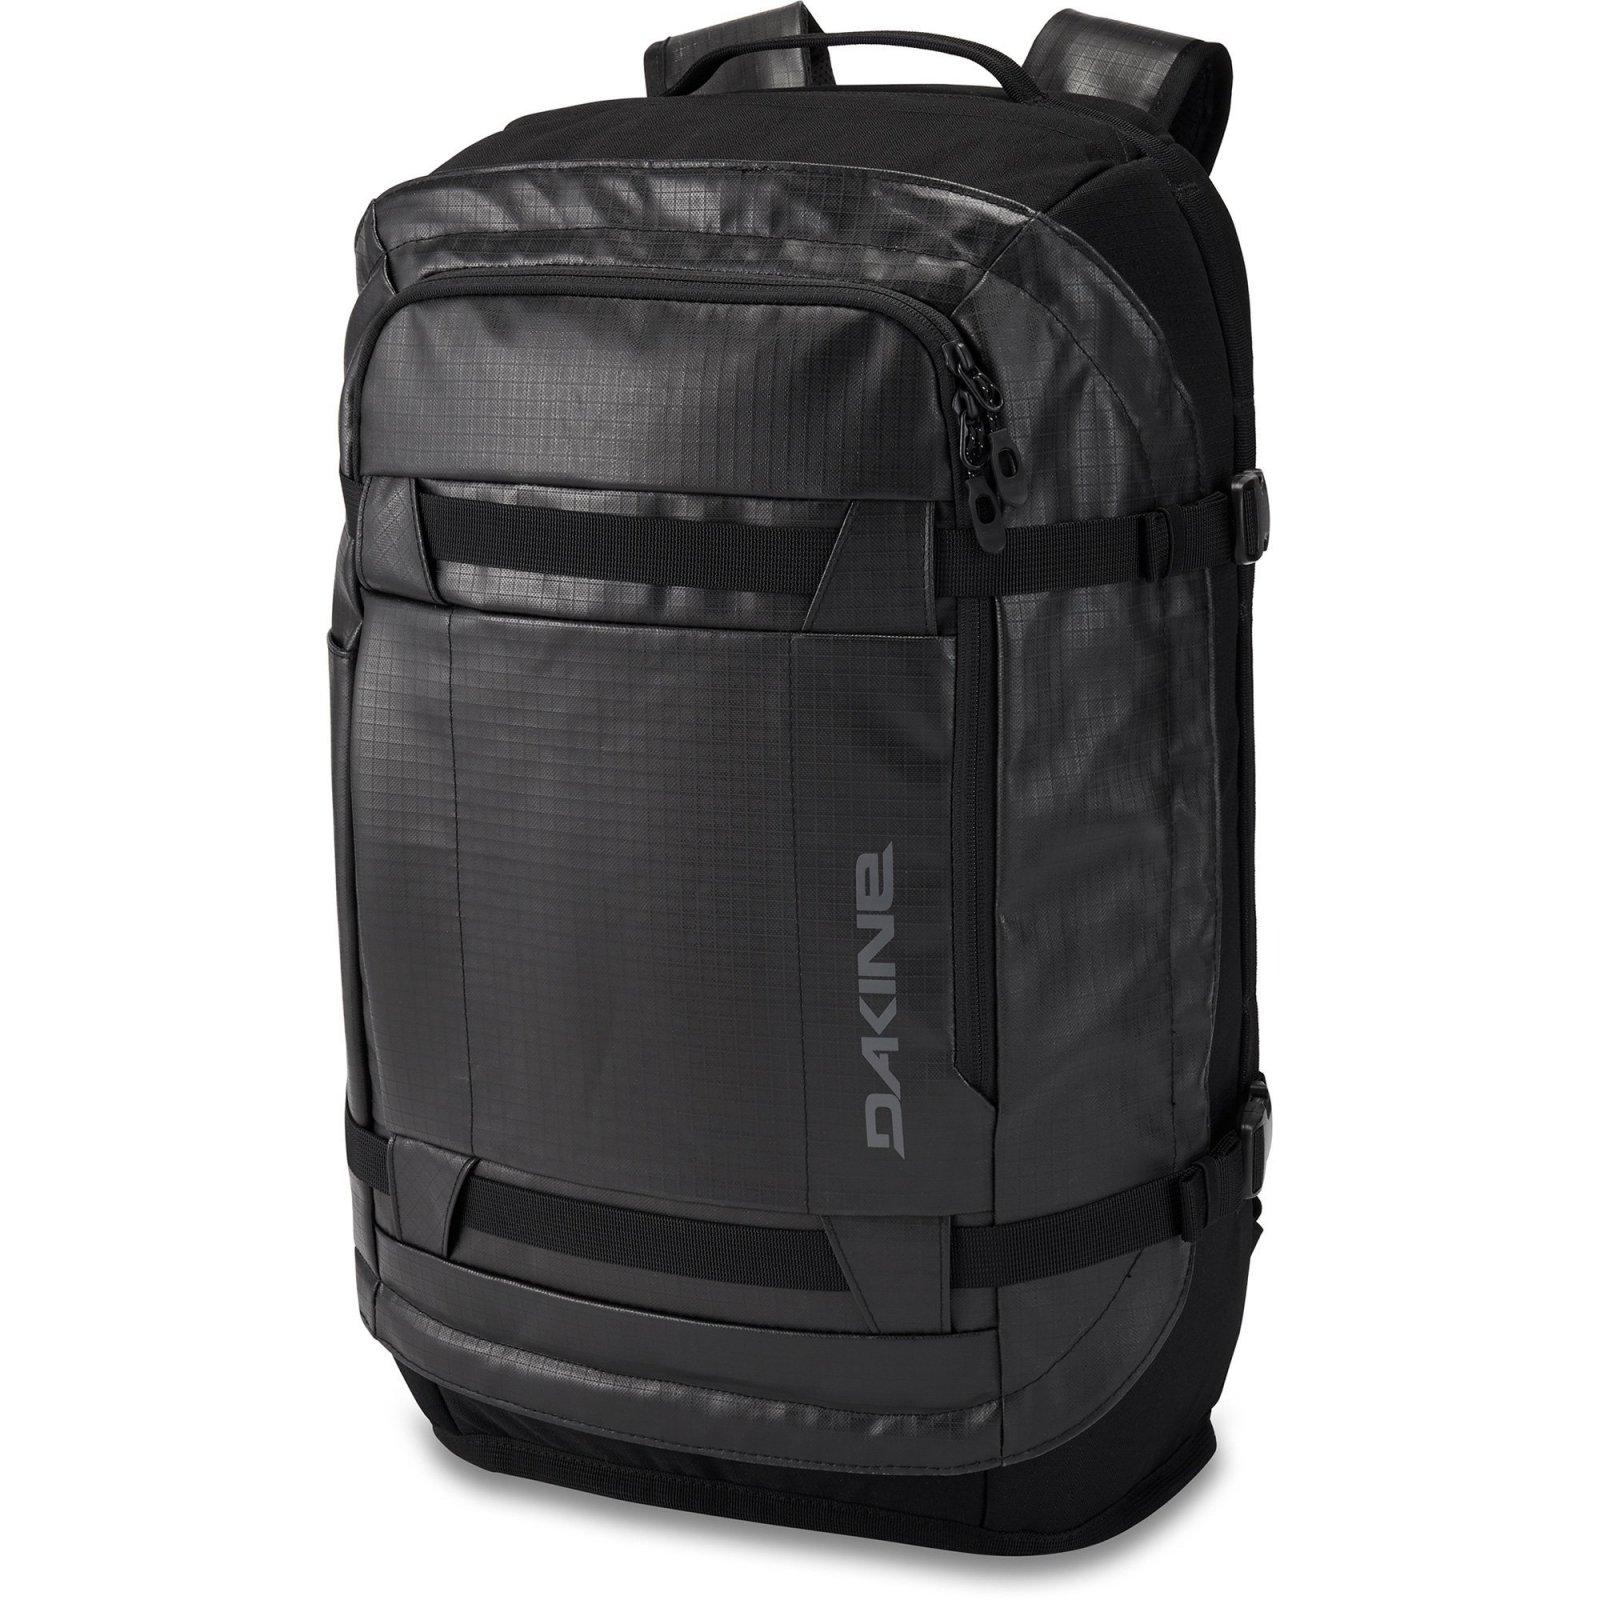 Dakine Ranger Travel Pack 45L (Multiple Color Options)